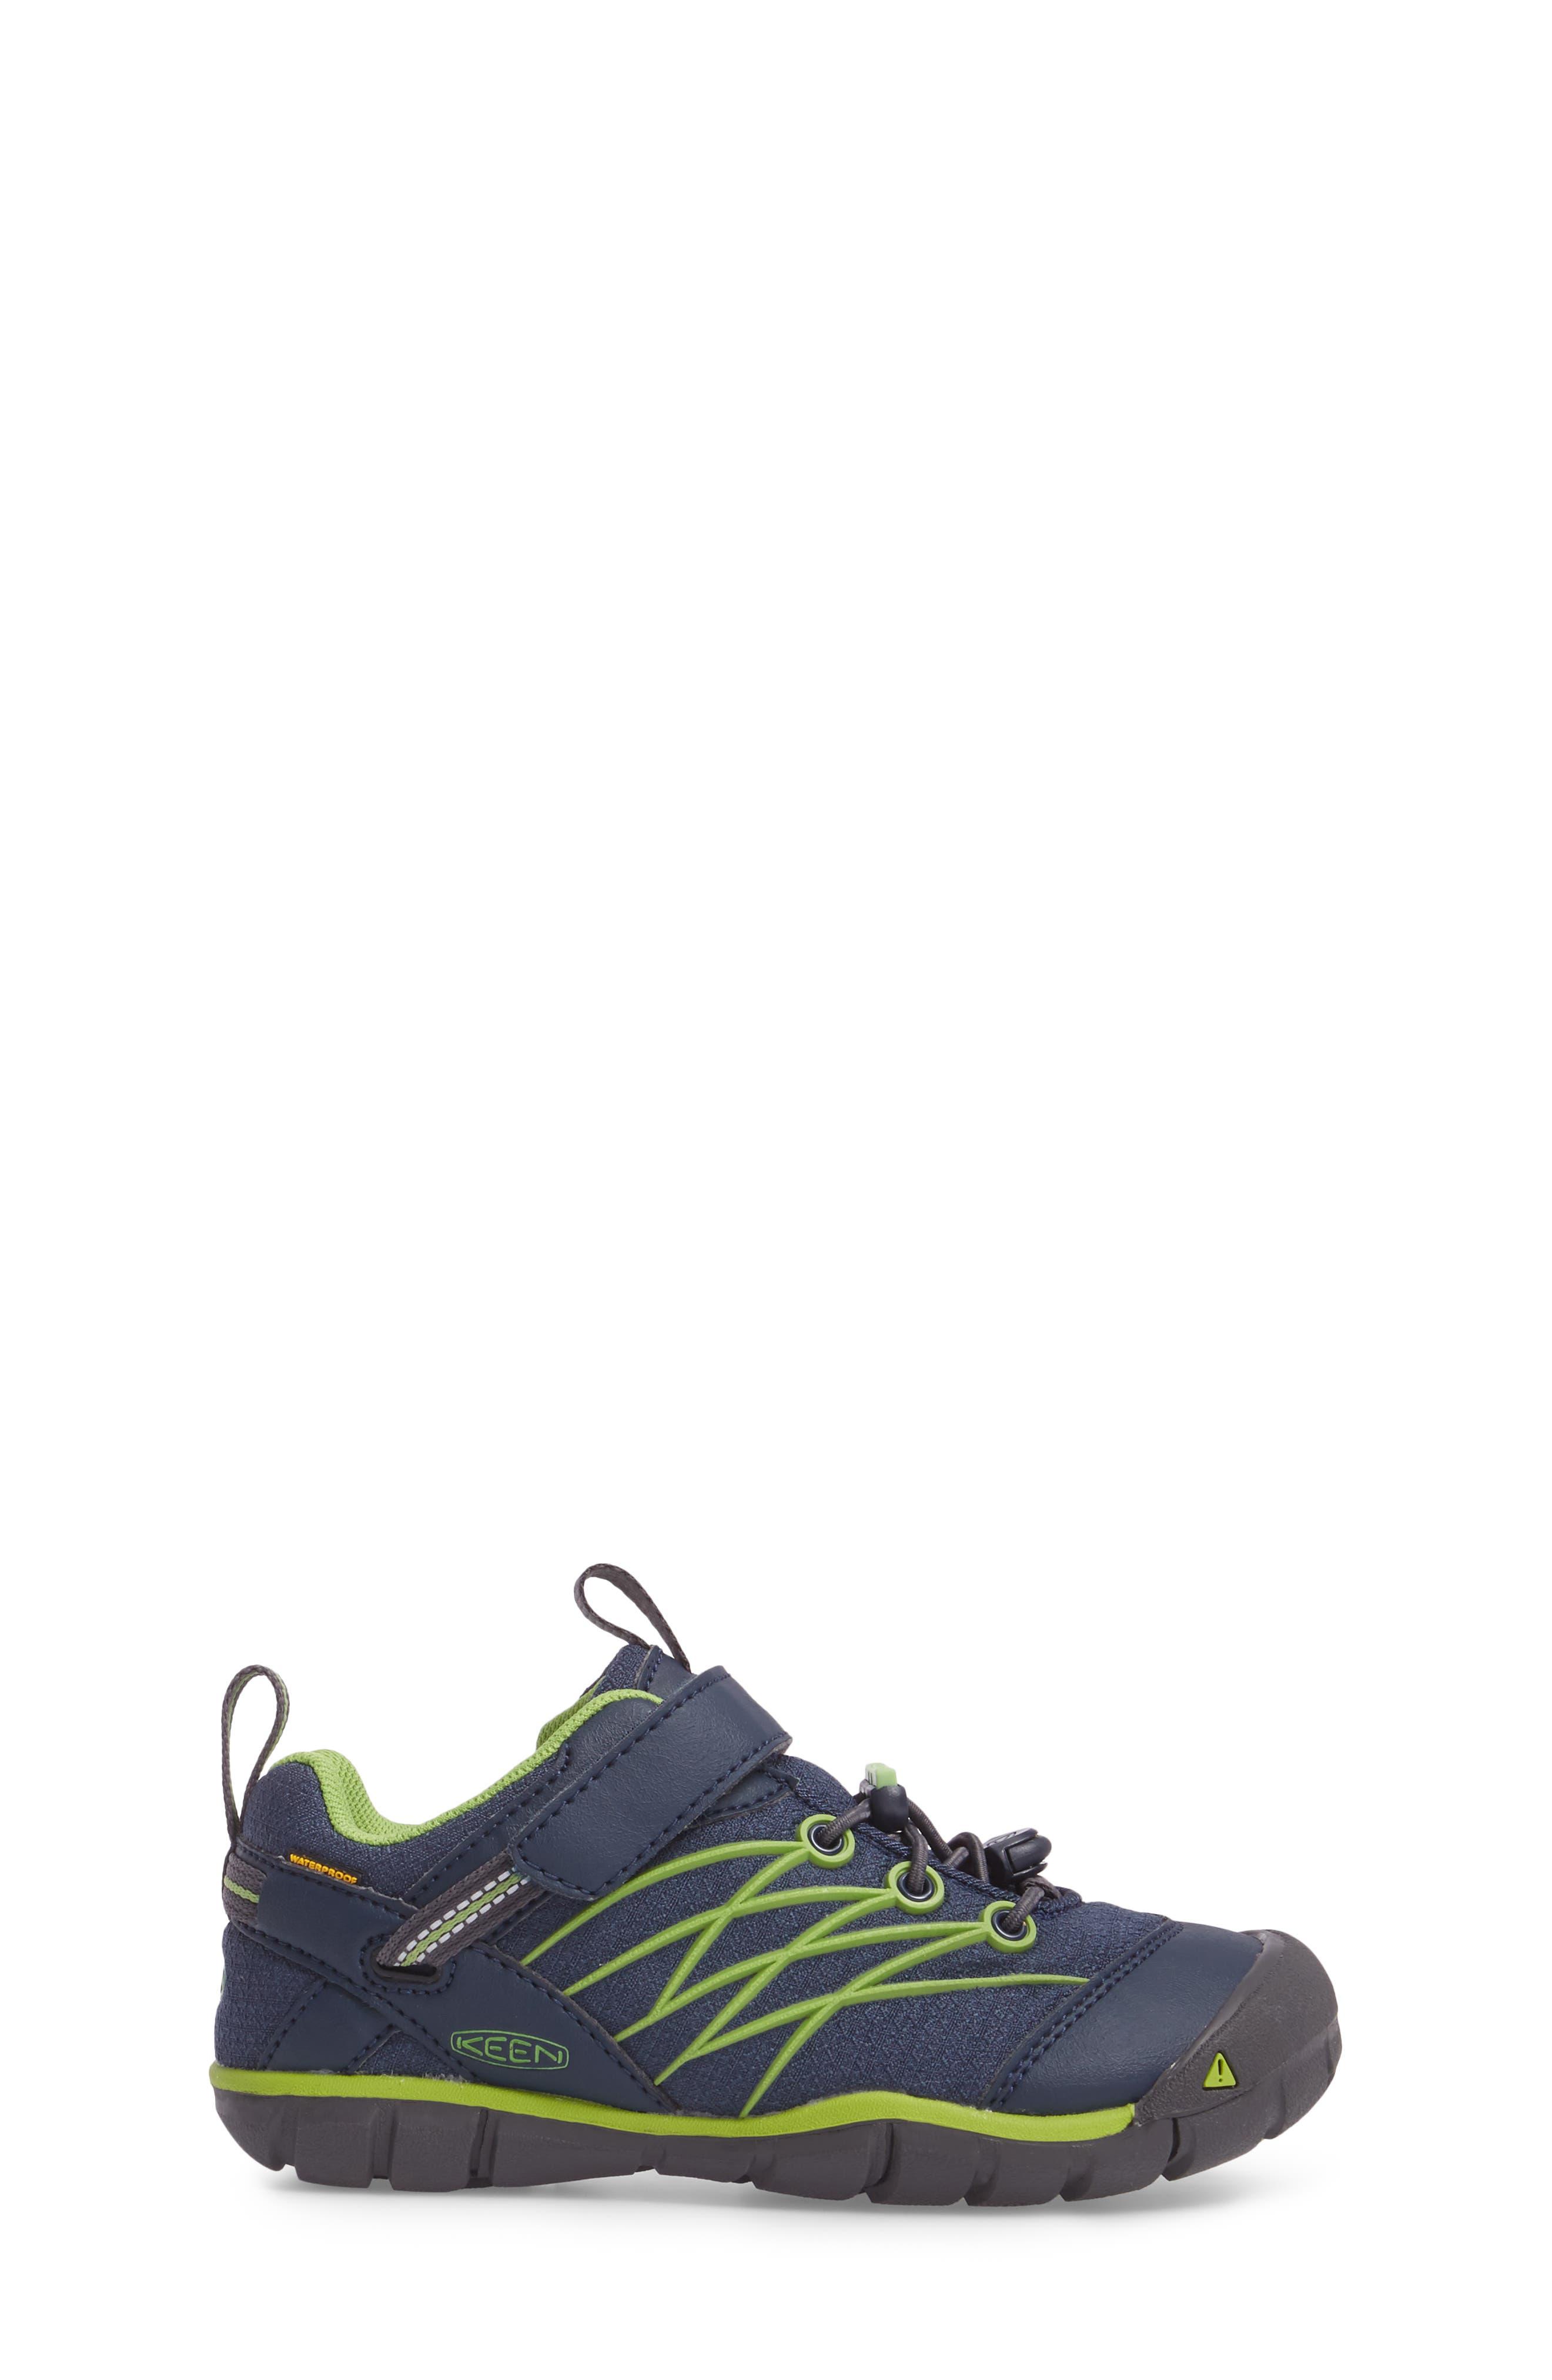 Chandler CNX Waterproof Sneaker,                             Alternate thumbnail 3, color,                             Dress Blues/ Greenery